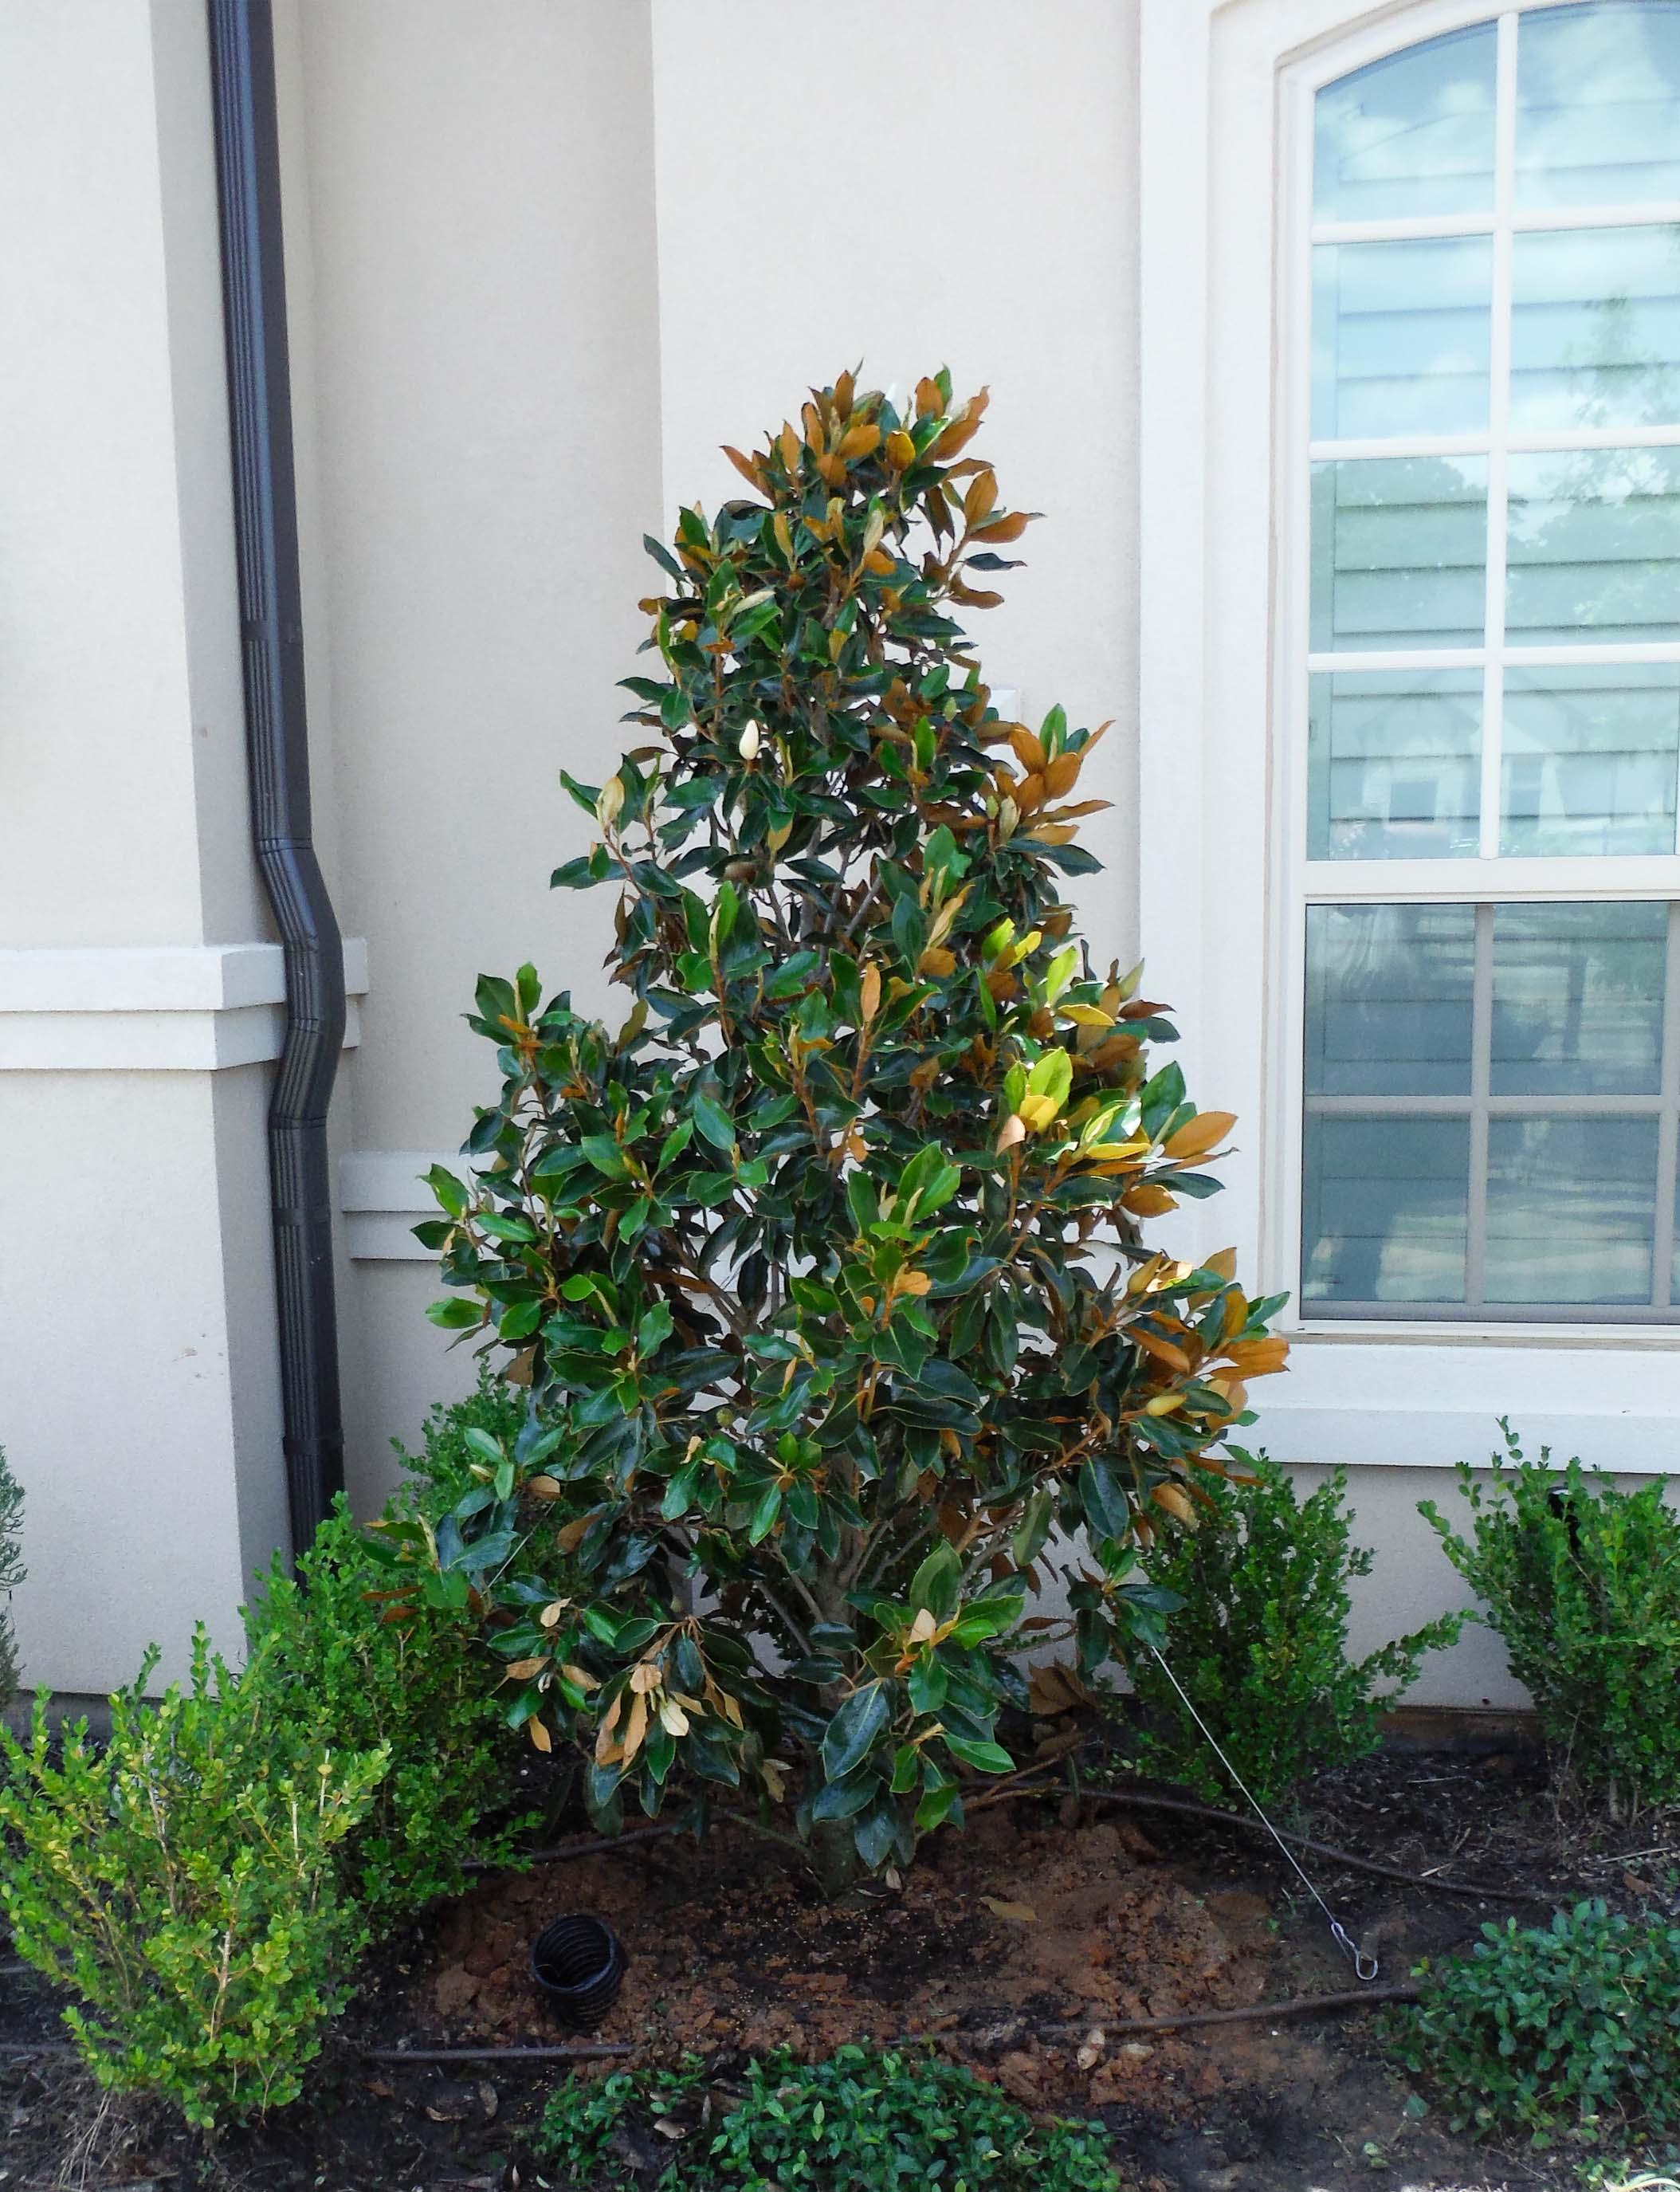 Little Gem Magnolias planted by Treeland Nursery in a flowerbed.